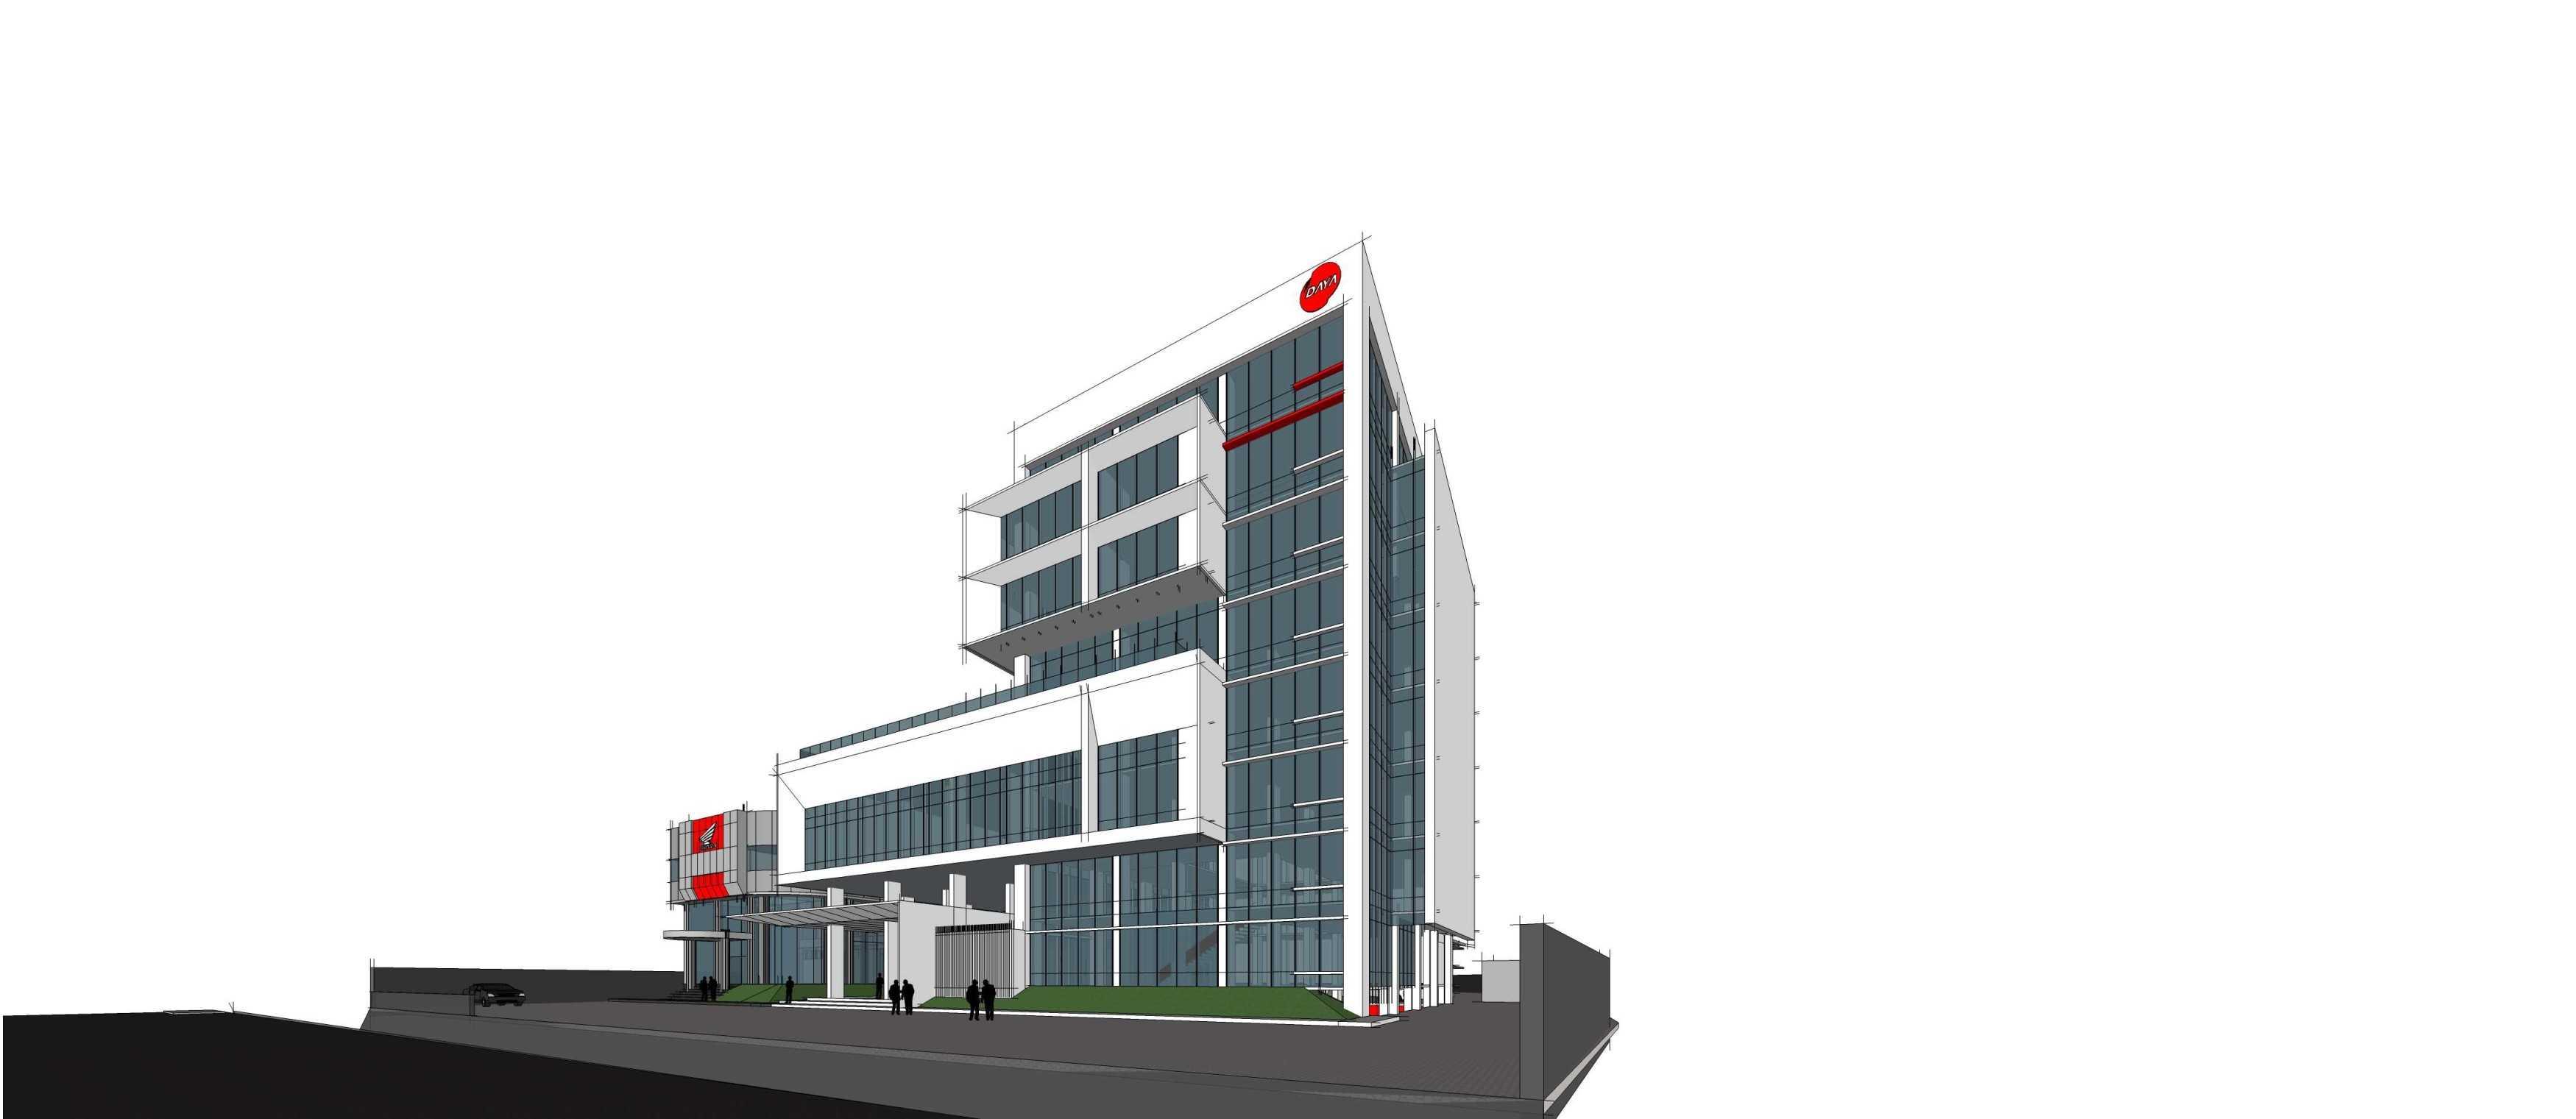 Gubah Ruang Daya Tc & Office Bandung, Kota Bandung, Jawa Barat, Indonesia Bandung, Kota Bandung, Jawa Barat, Indonesia Exterior View Modern  50837